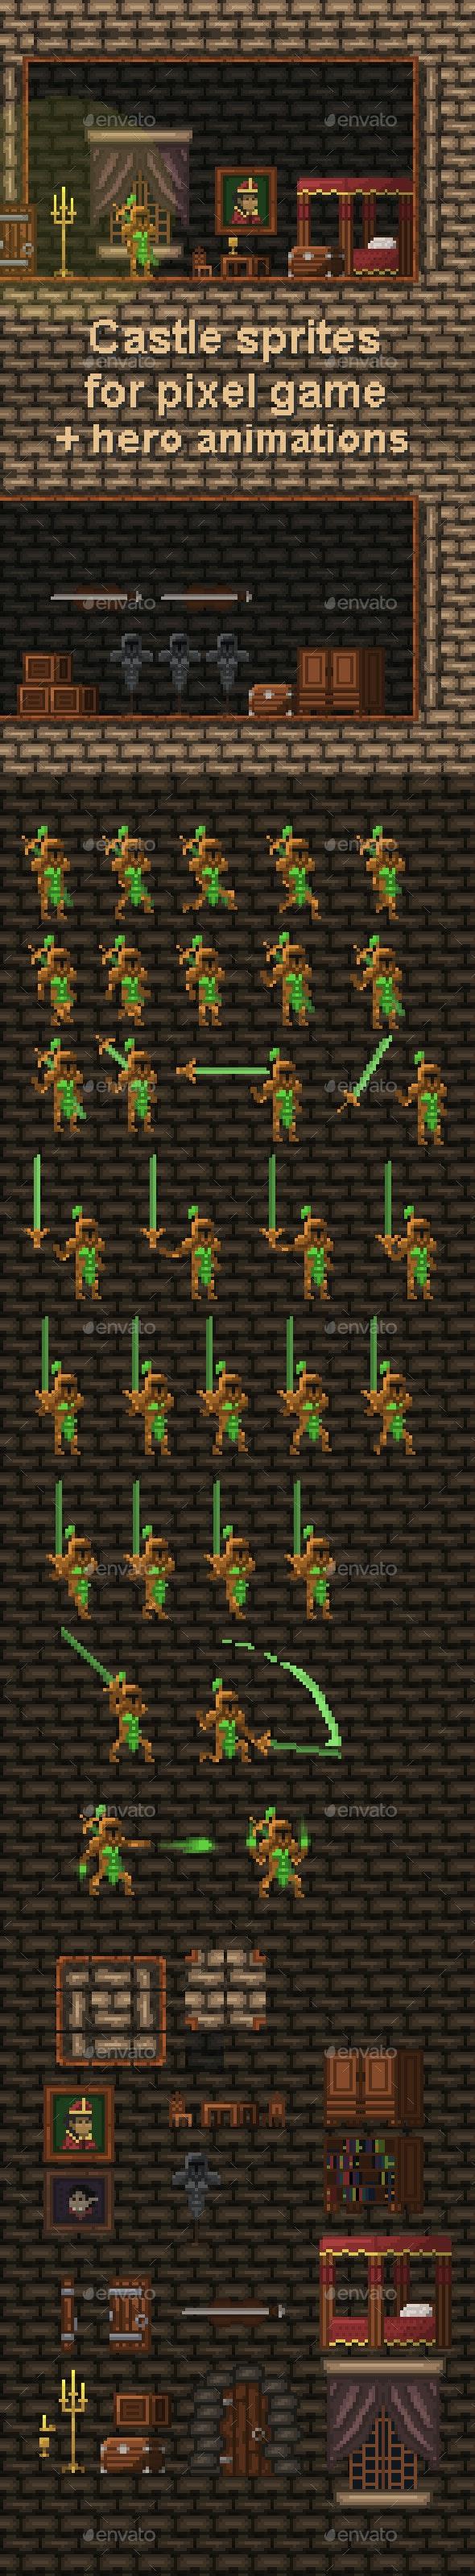 Castle Sprites for Pixel Game - Game Kits Game Assets